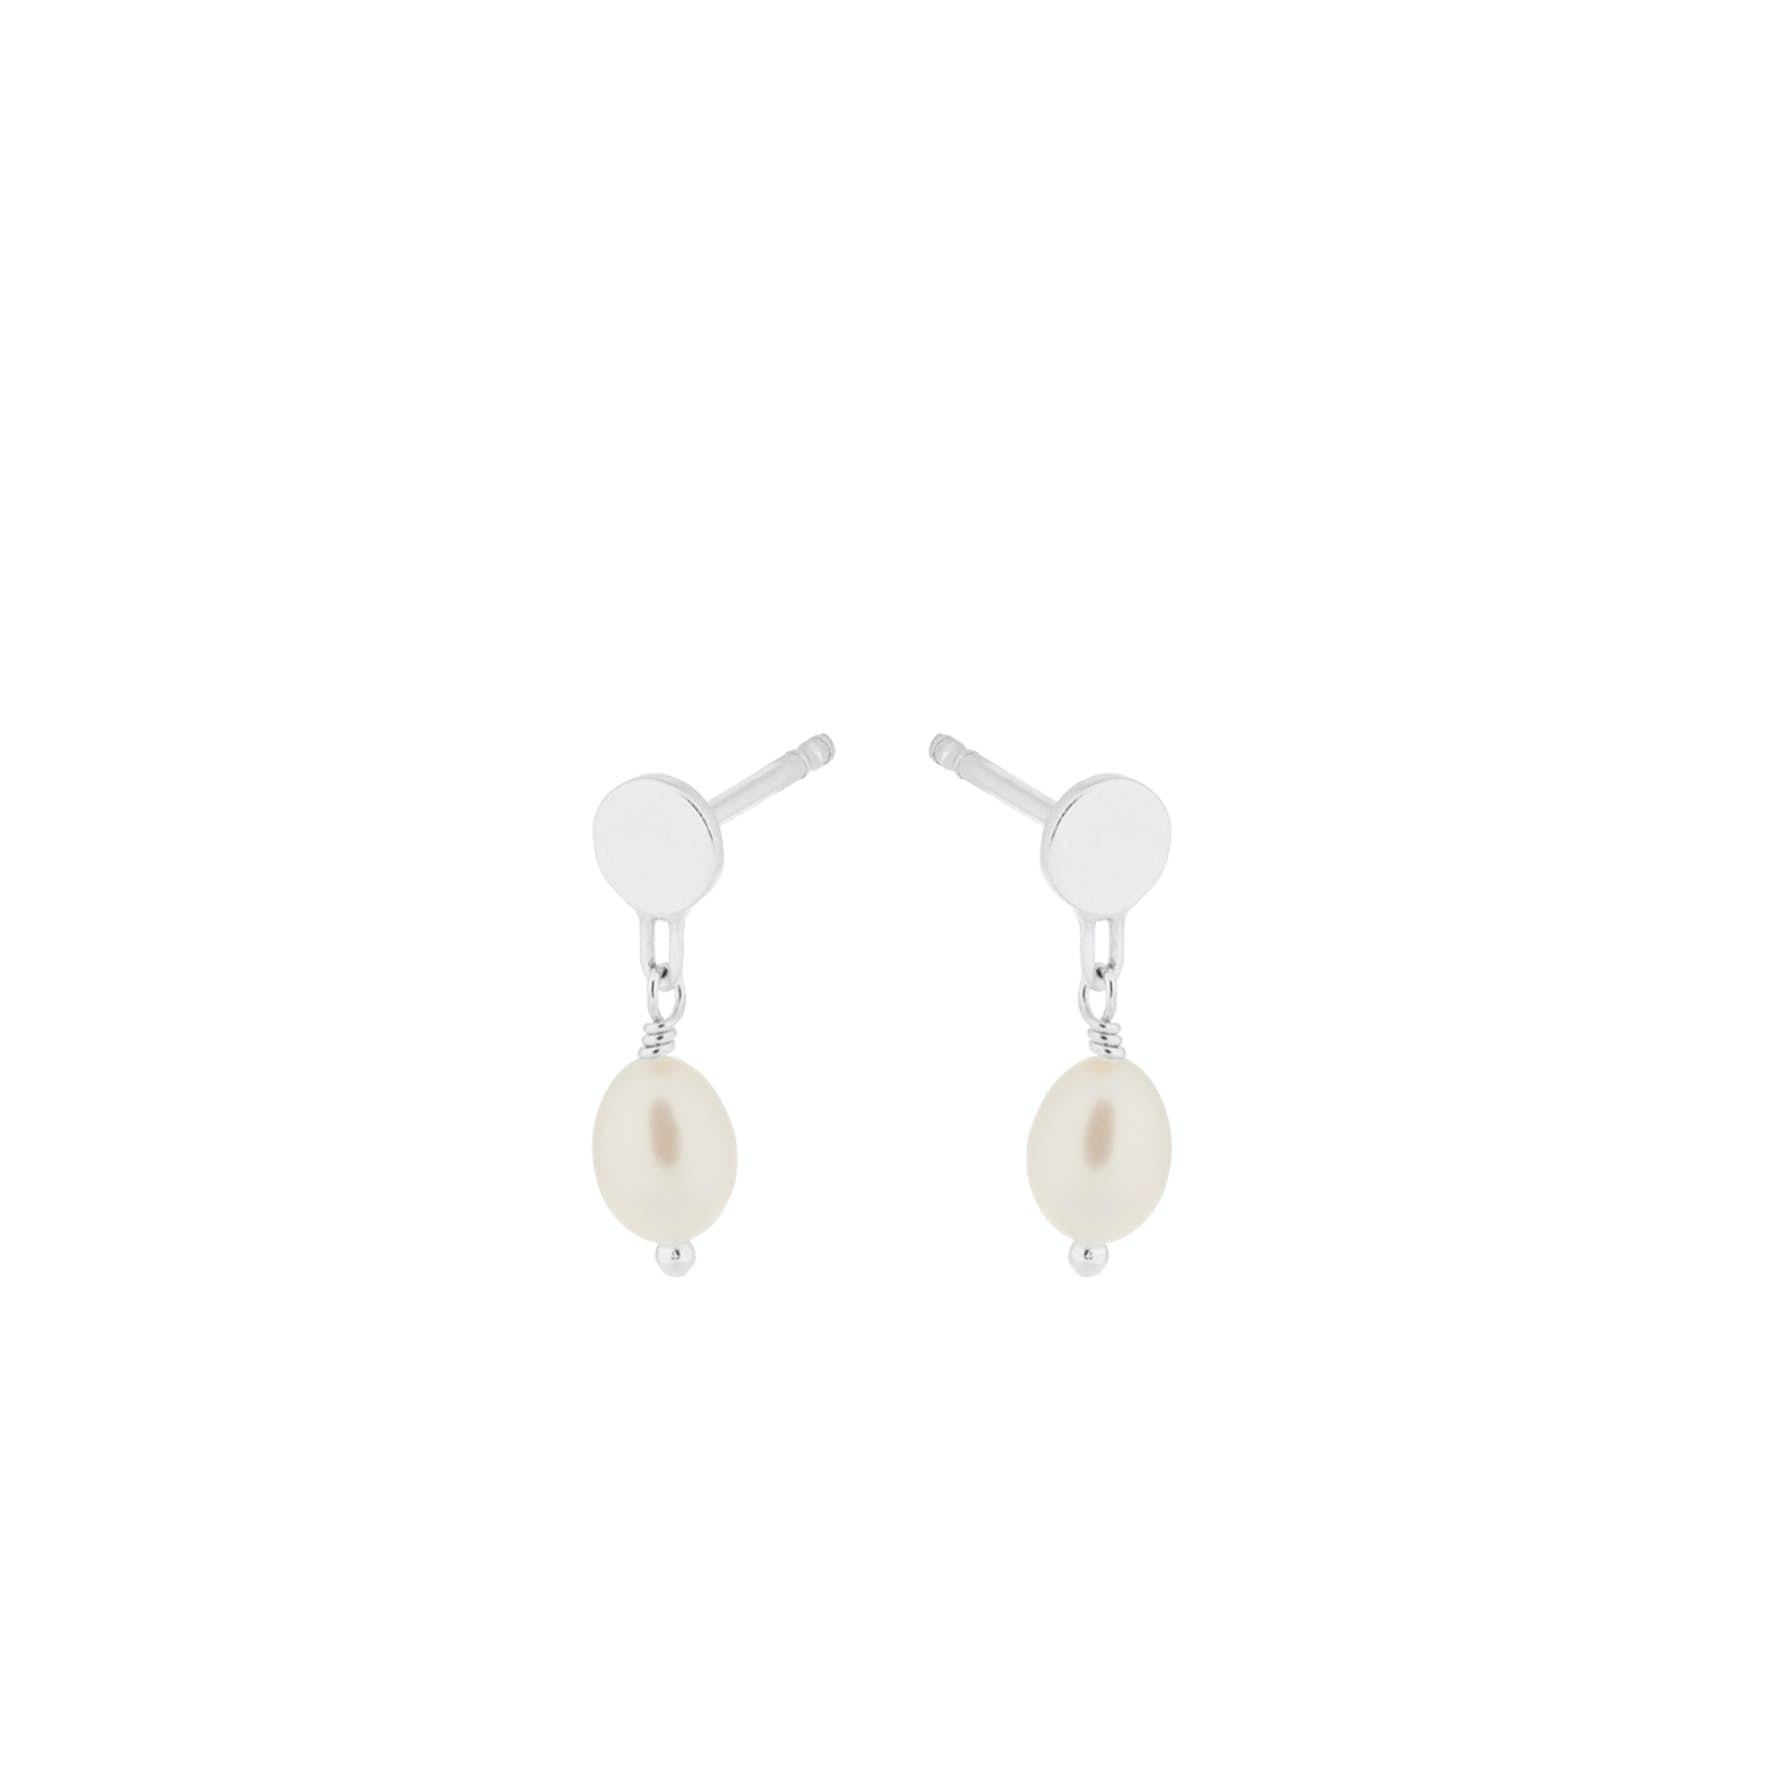 Ocean Dream Earsticks von Pernille Corydon in Silber Sterling 925|Freshwater Pearl